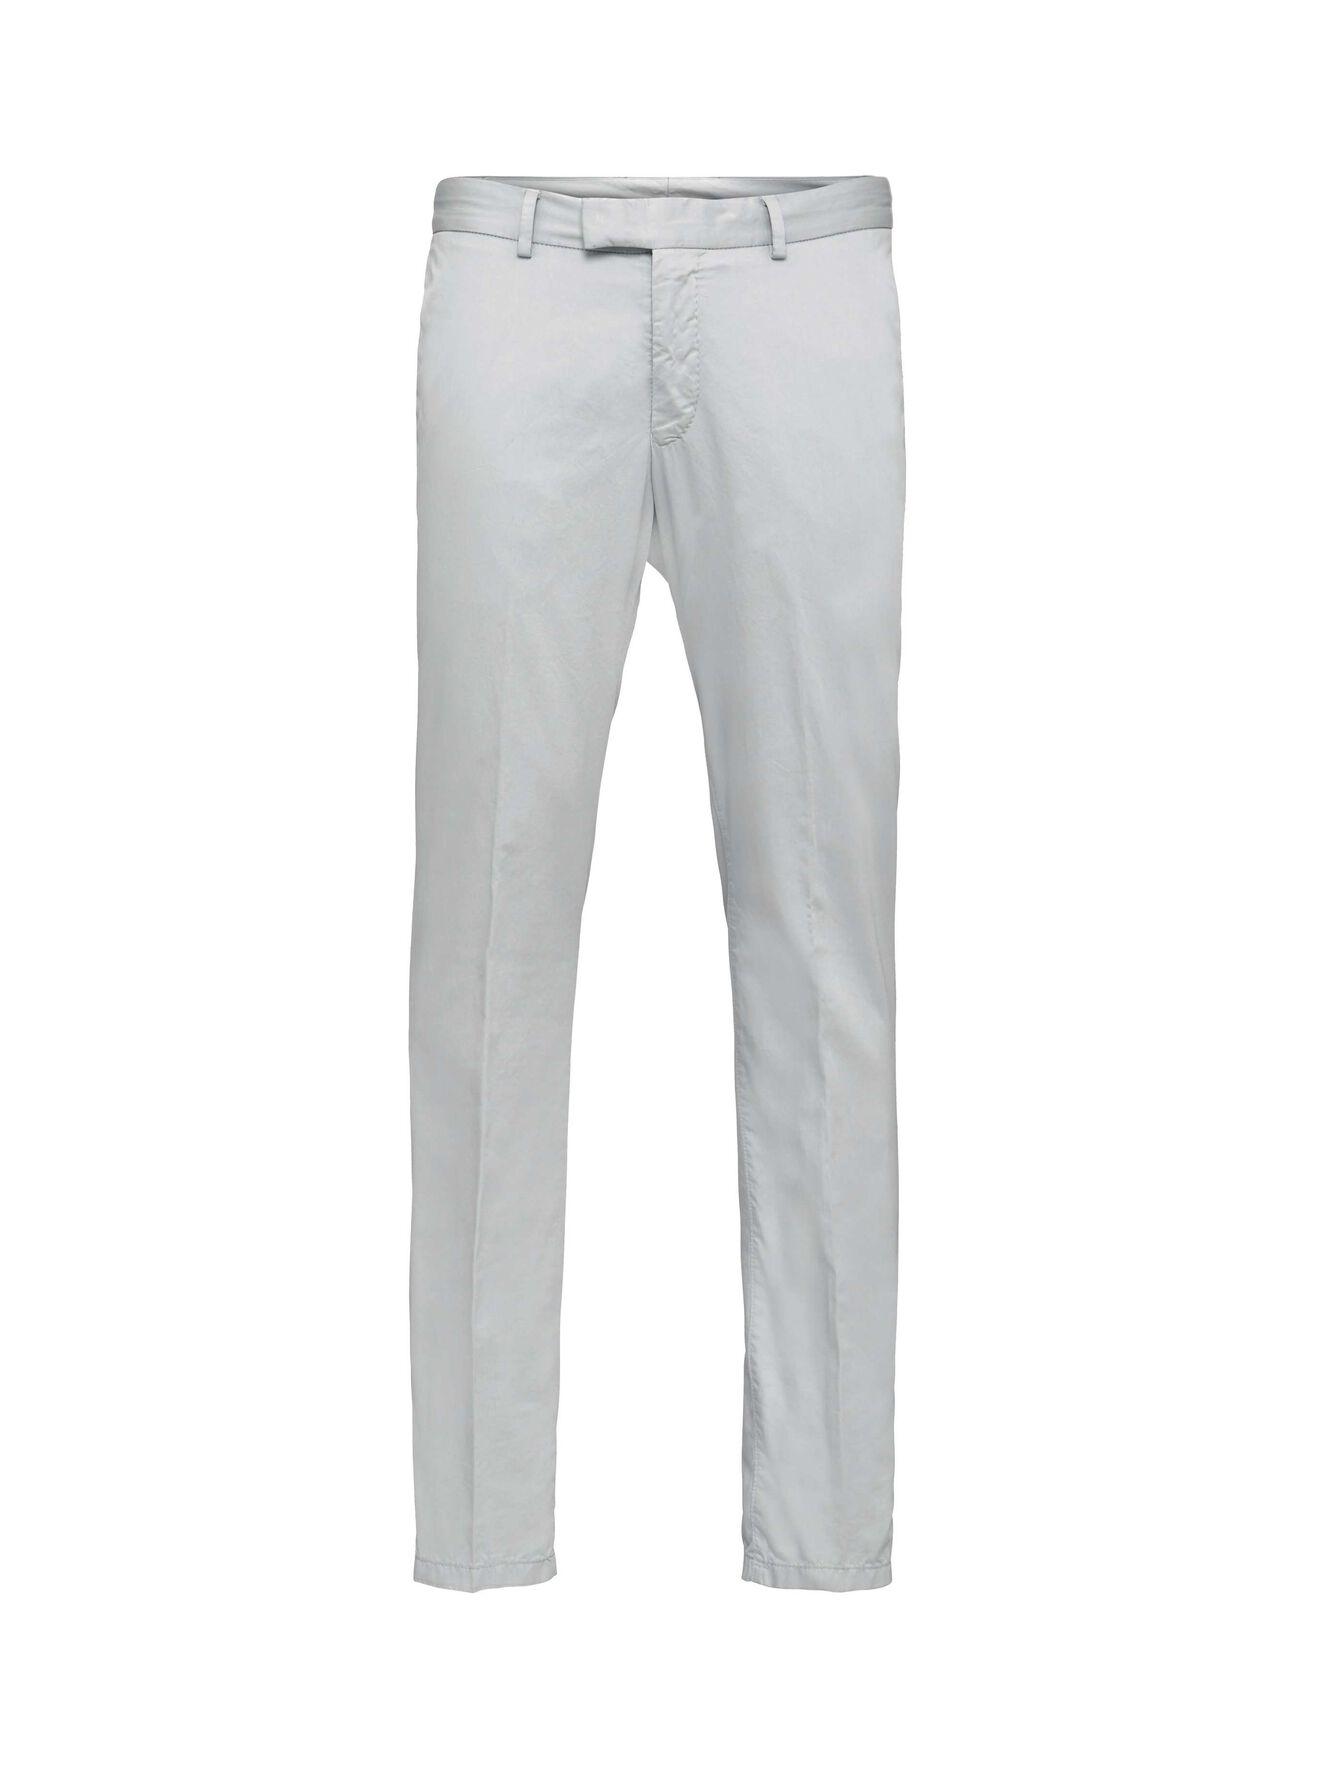 Gordon Ppt Trousers in Light grey melange from Tiger of Sweden